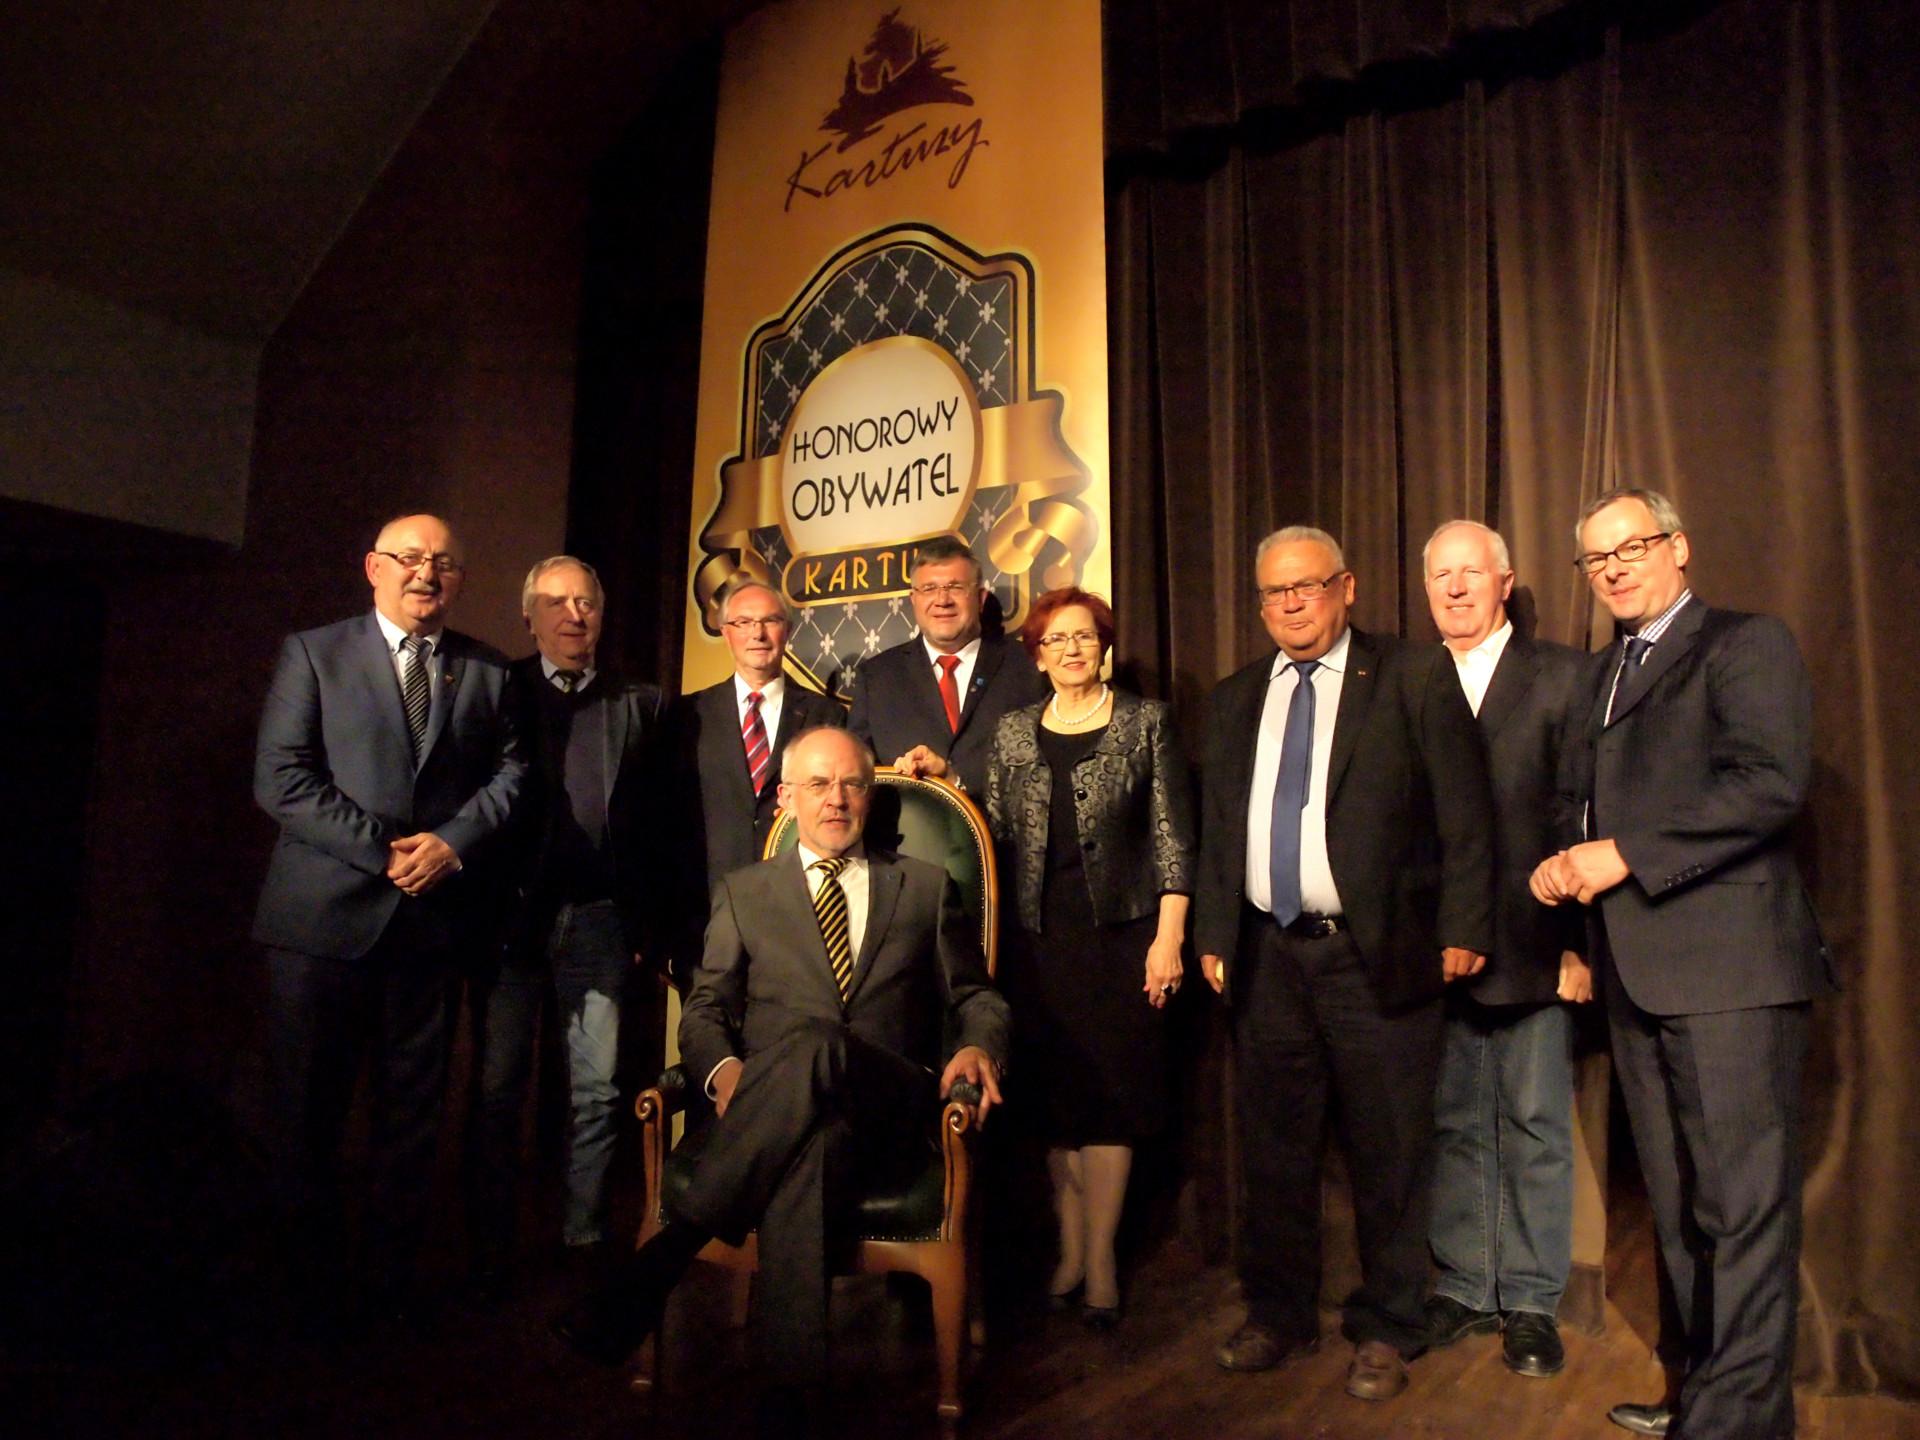 25-lecie partnerstwa gminy Kartuzy i miasta Duderstadt 7